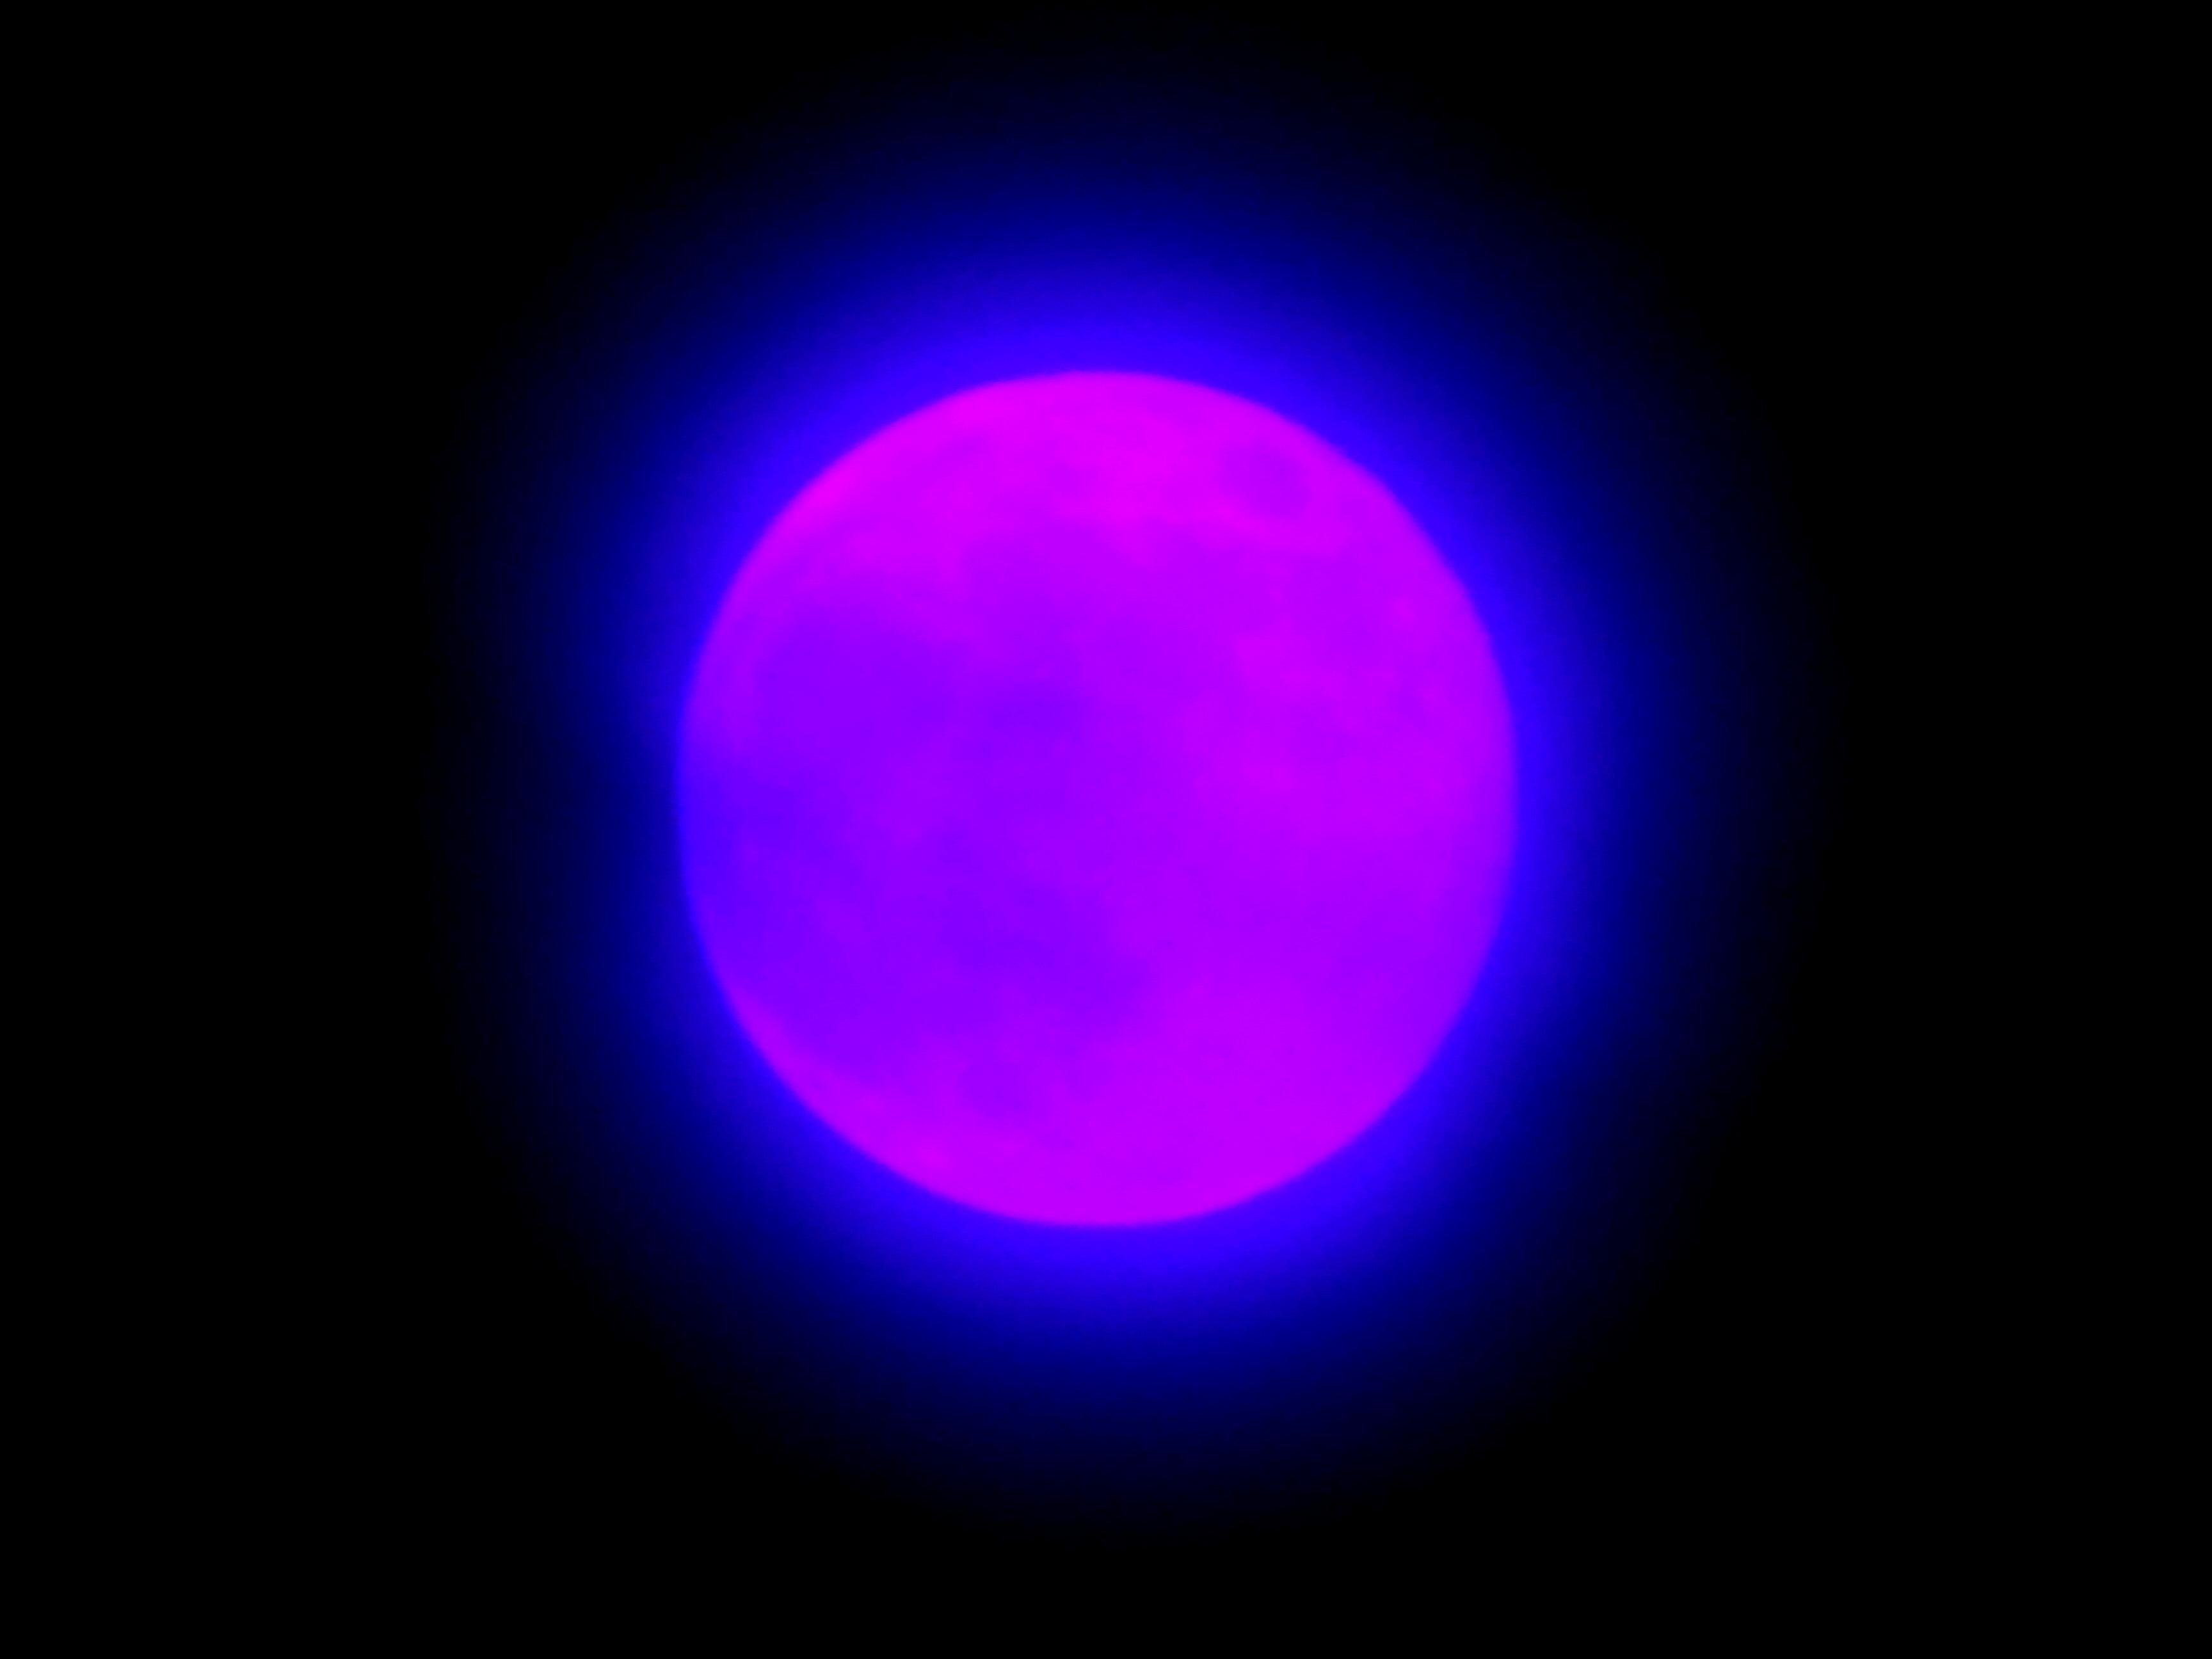 Moon 20200507_UV_P1790426c1.JPG